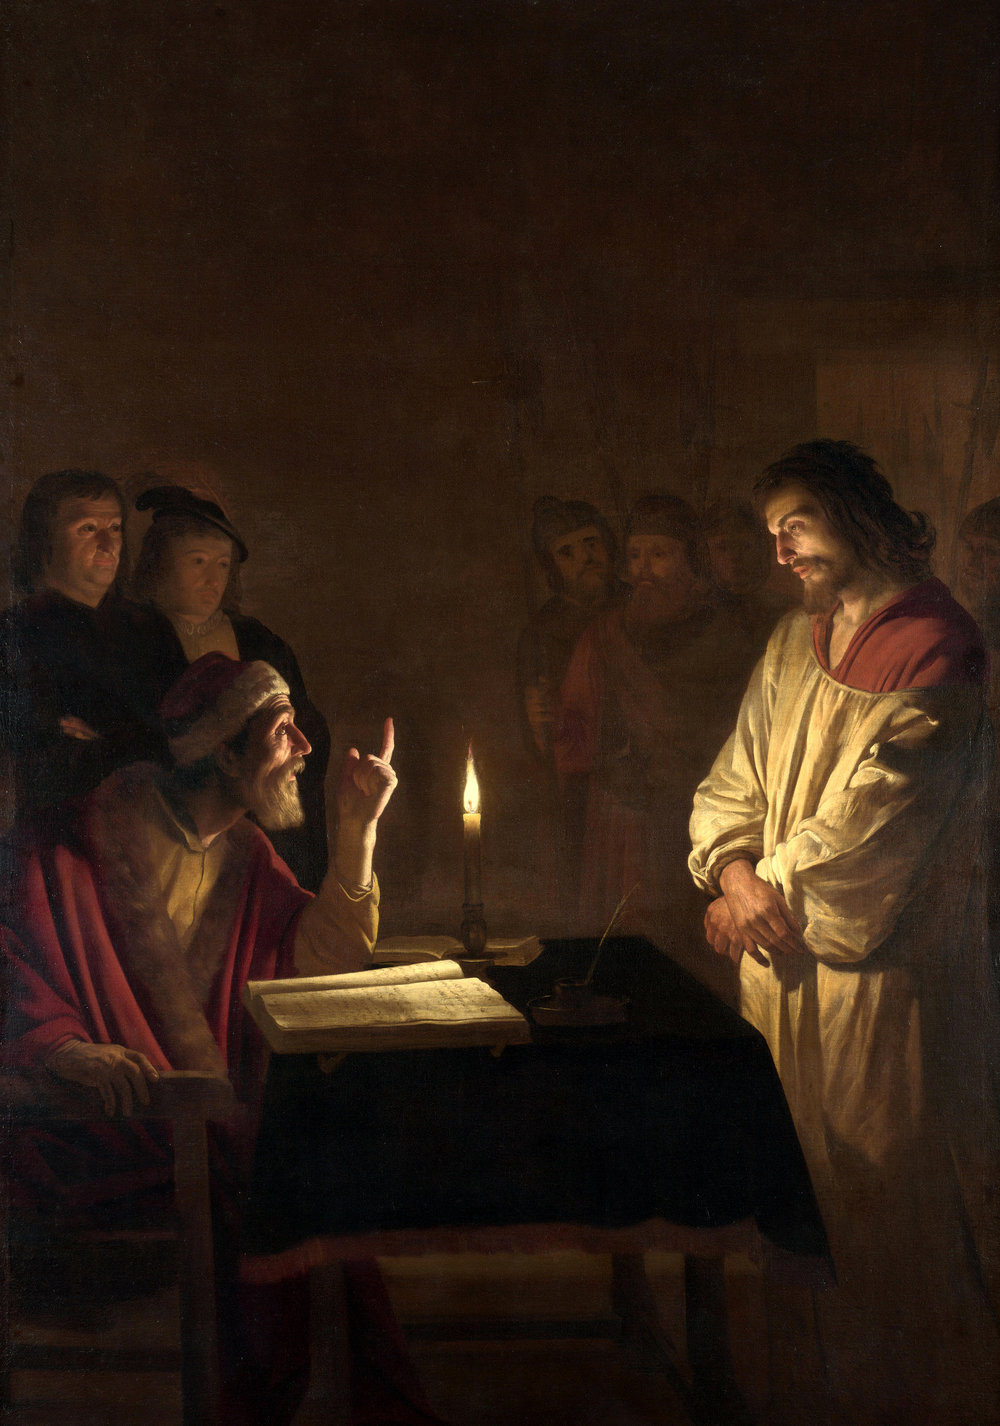 Gerard_van_Honthorst_Christ_before_the_High_Priest_WGA11650.jpg